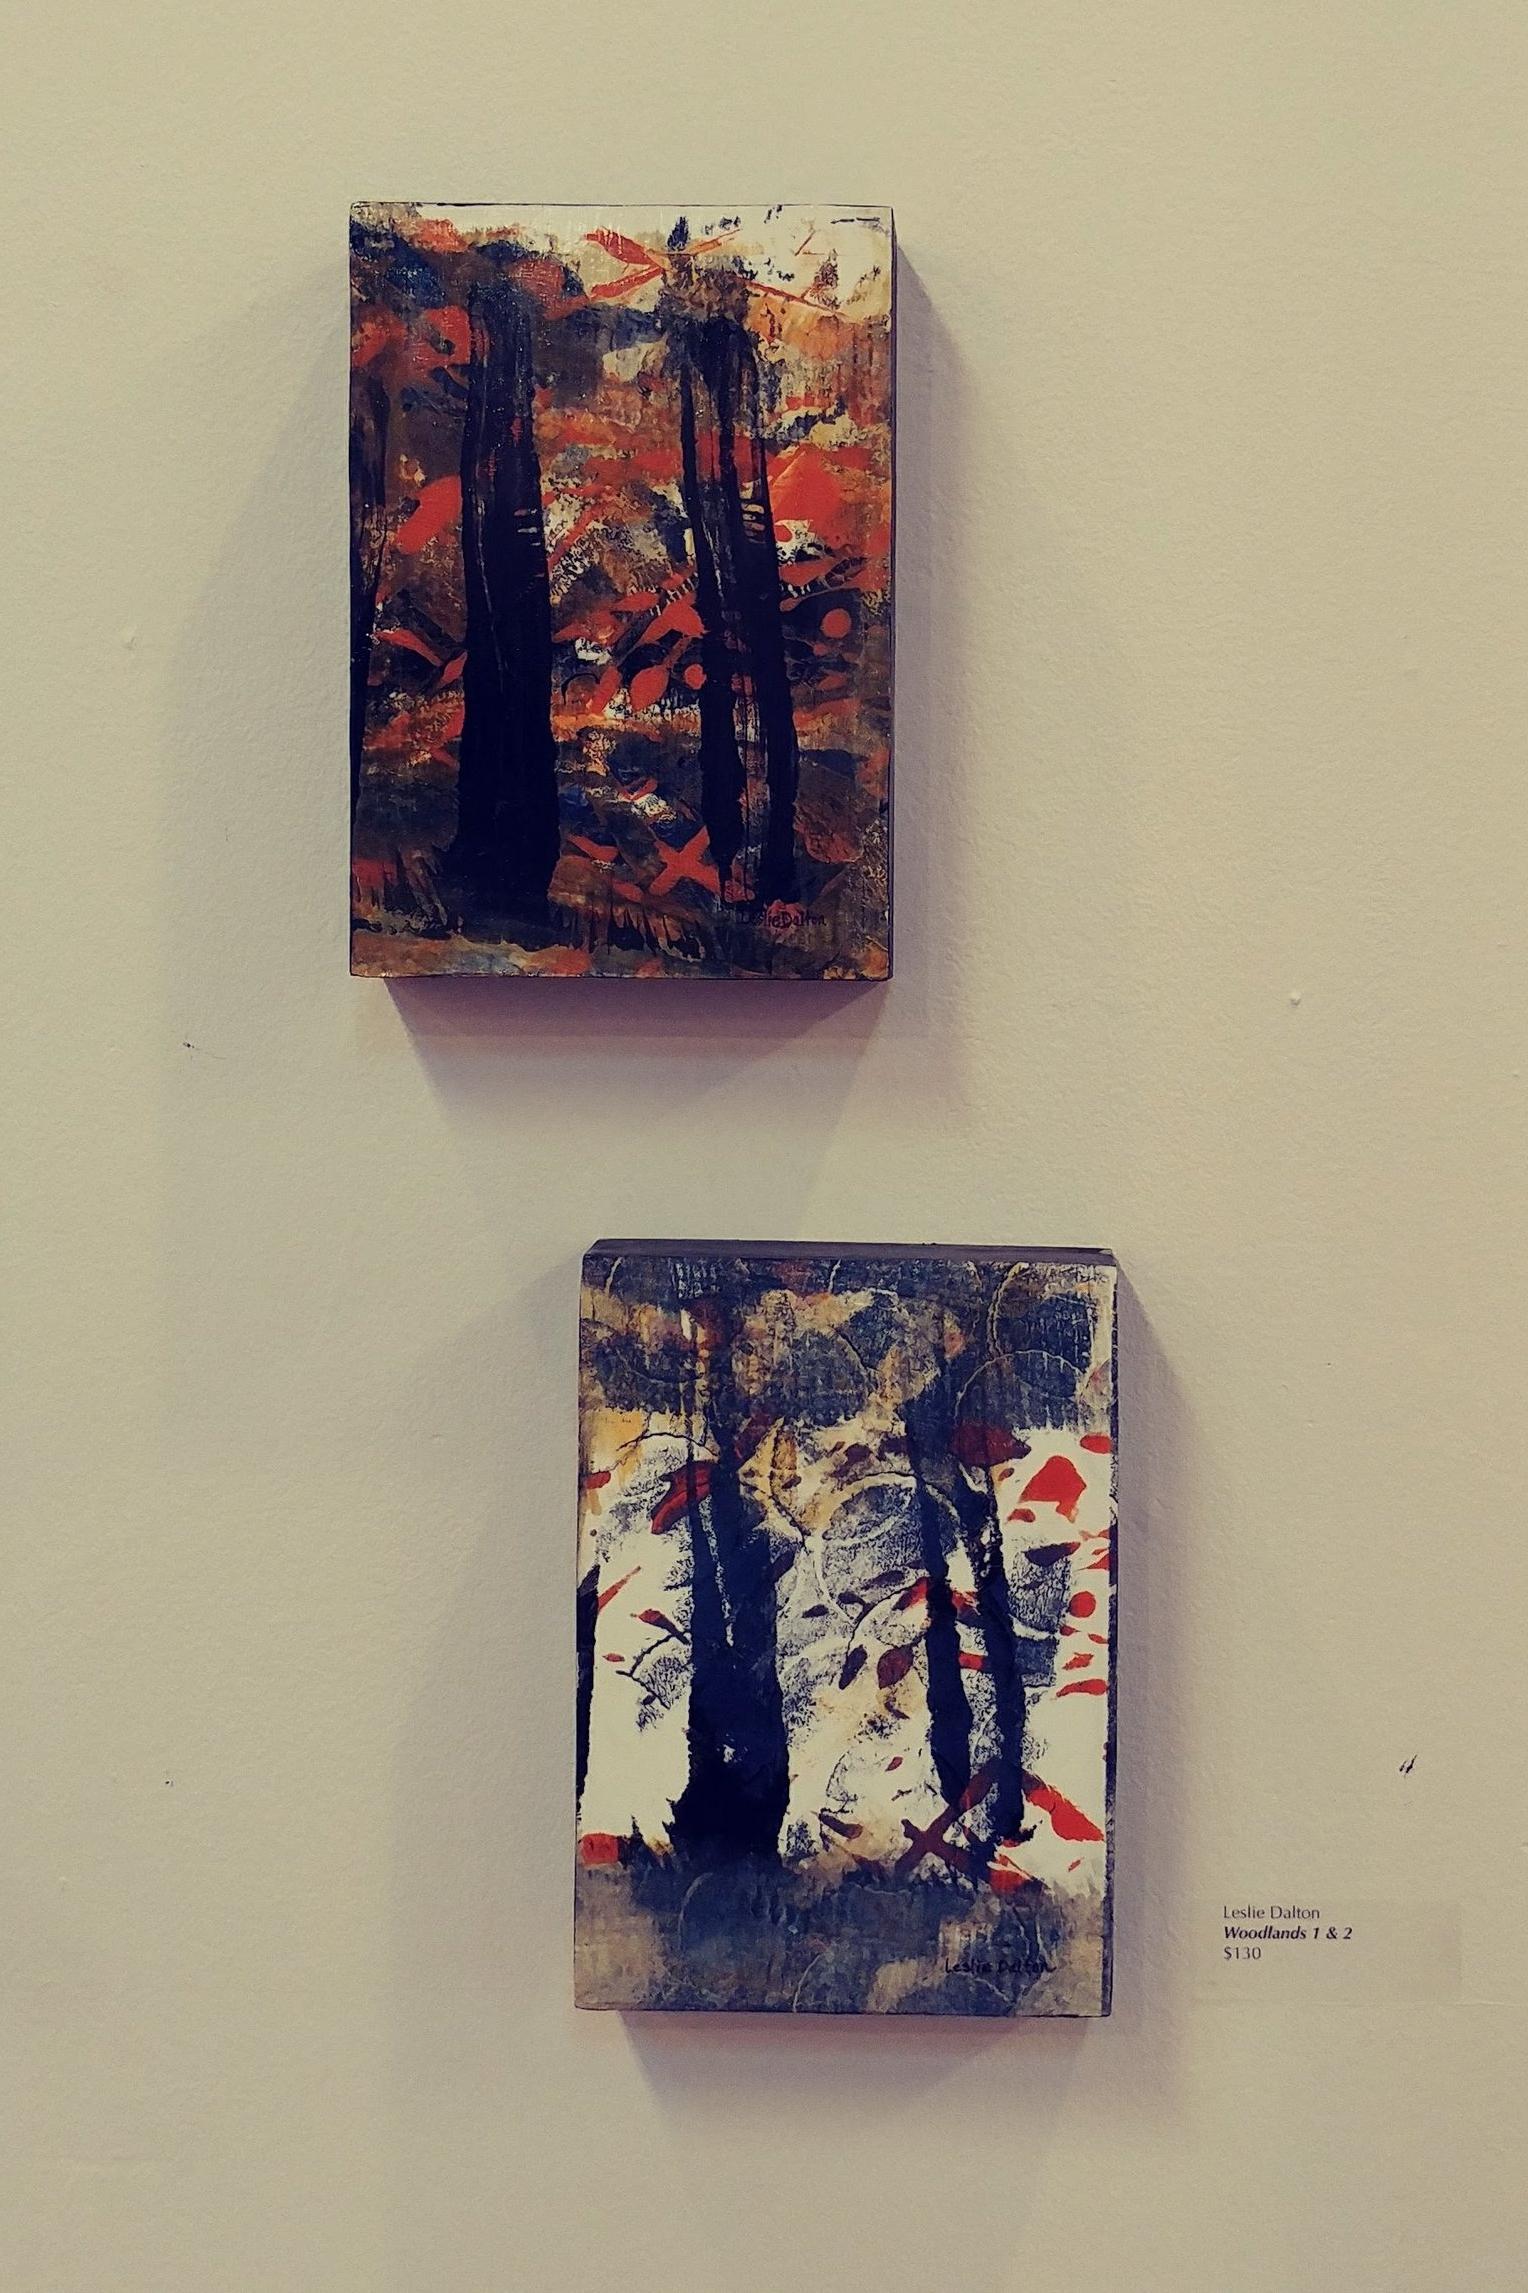 Woodlands I and Woodlands II